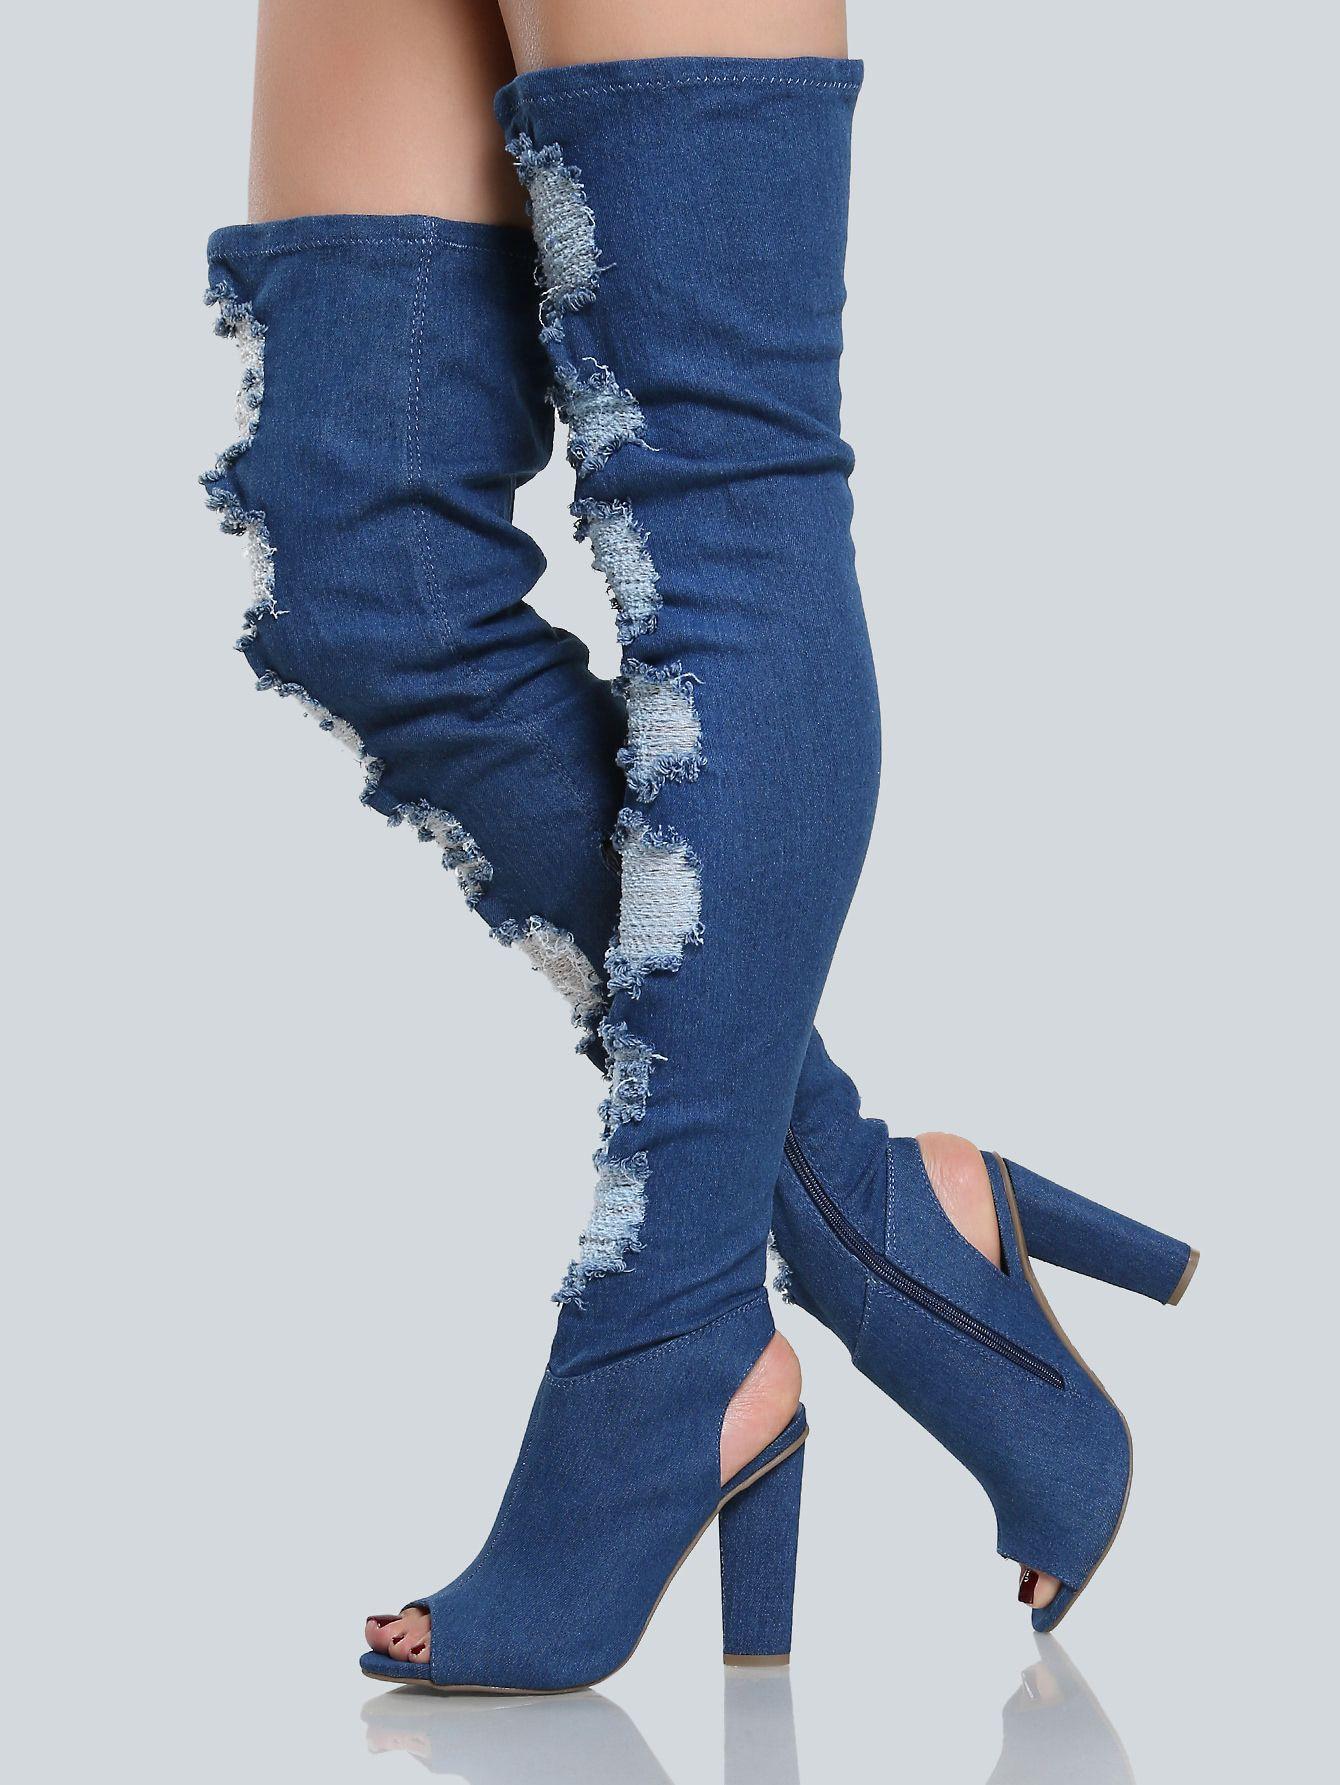 74f2fa21bbd Frayed+Peep+Toe. Shop Frayed Peep Toe Denim Thigh Highs ...